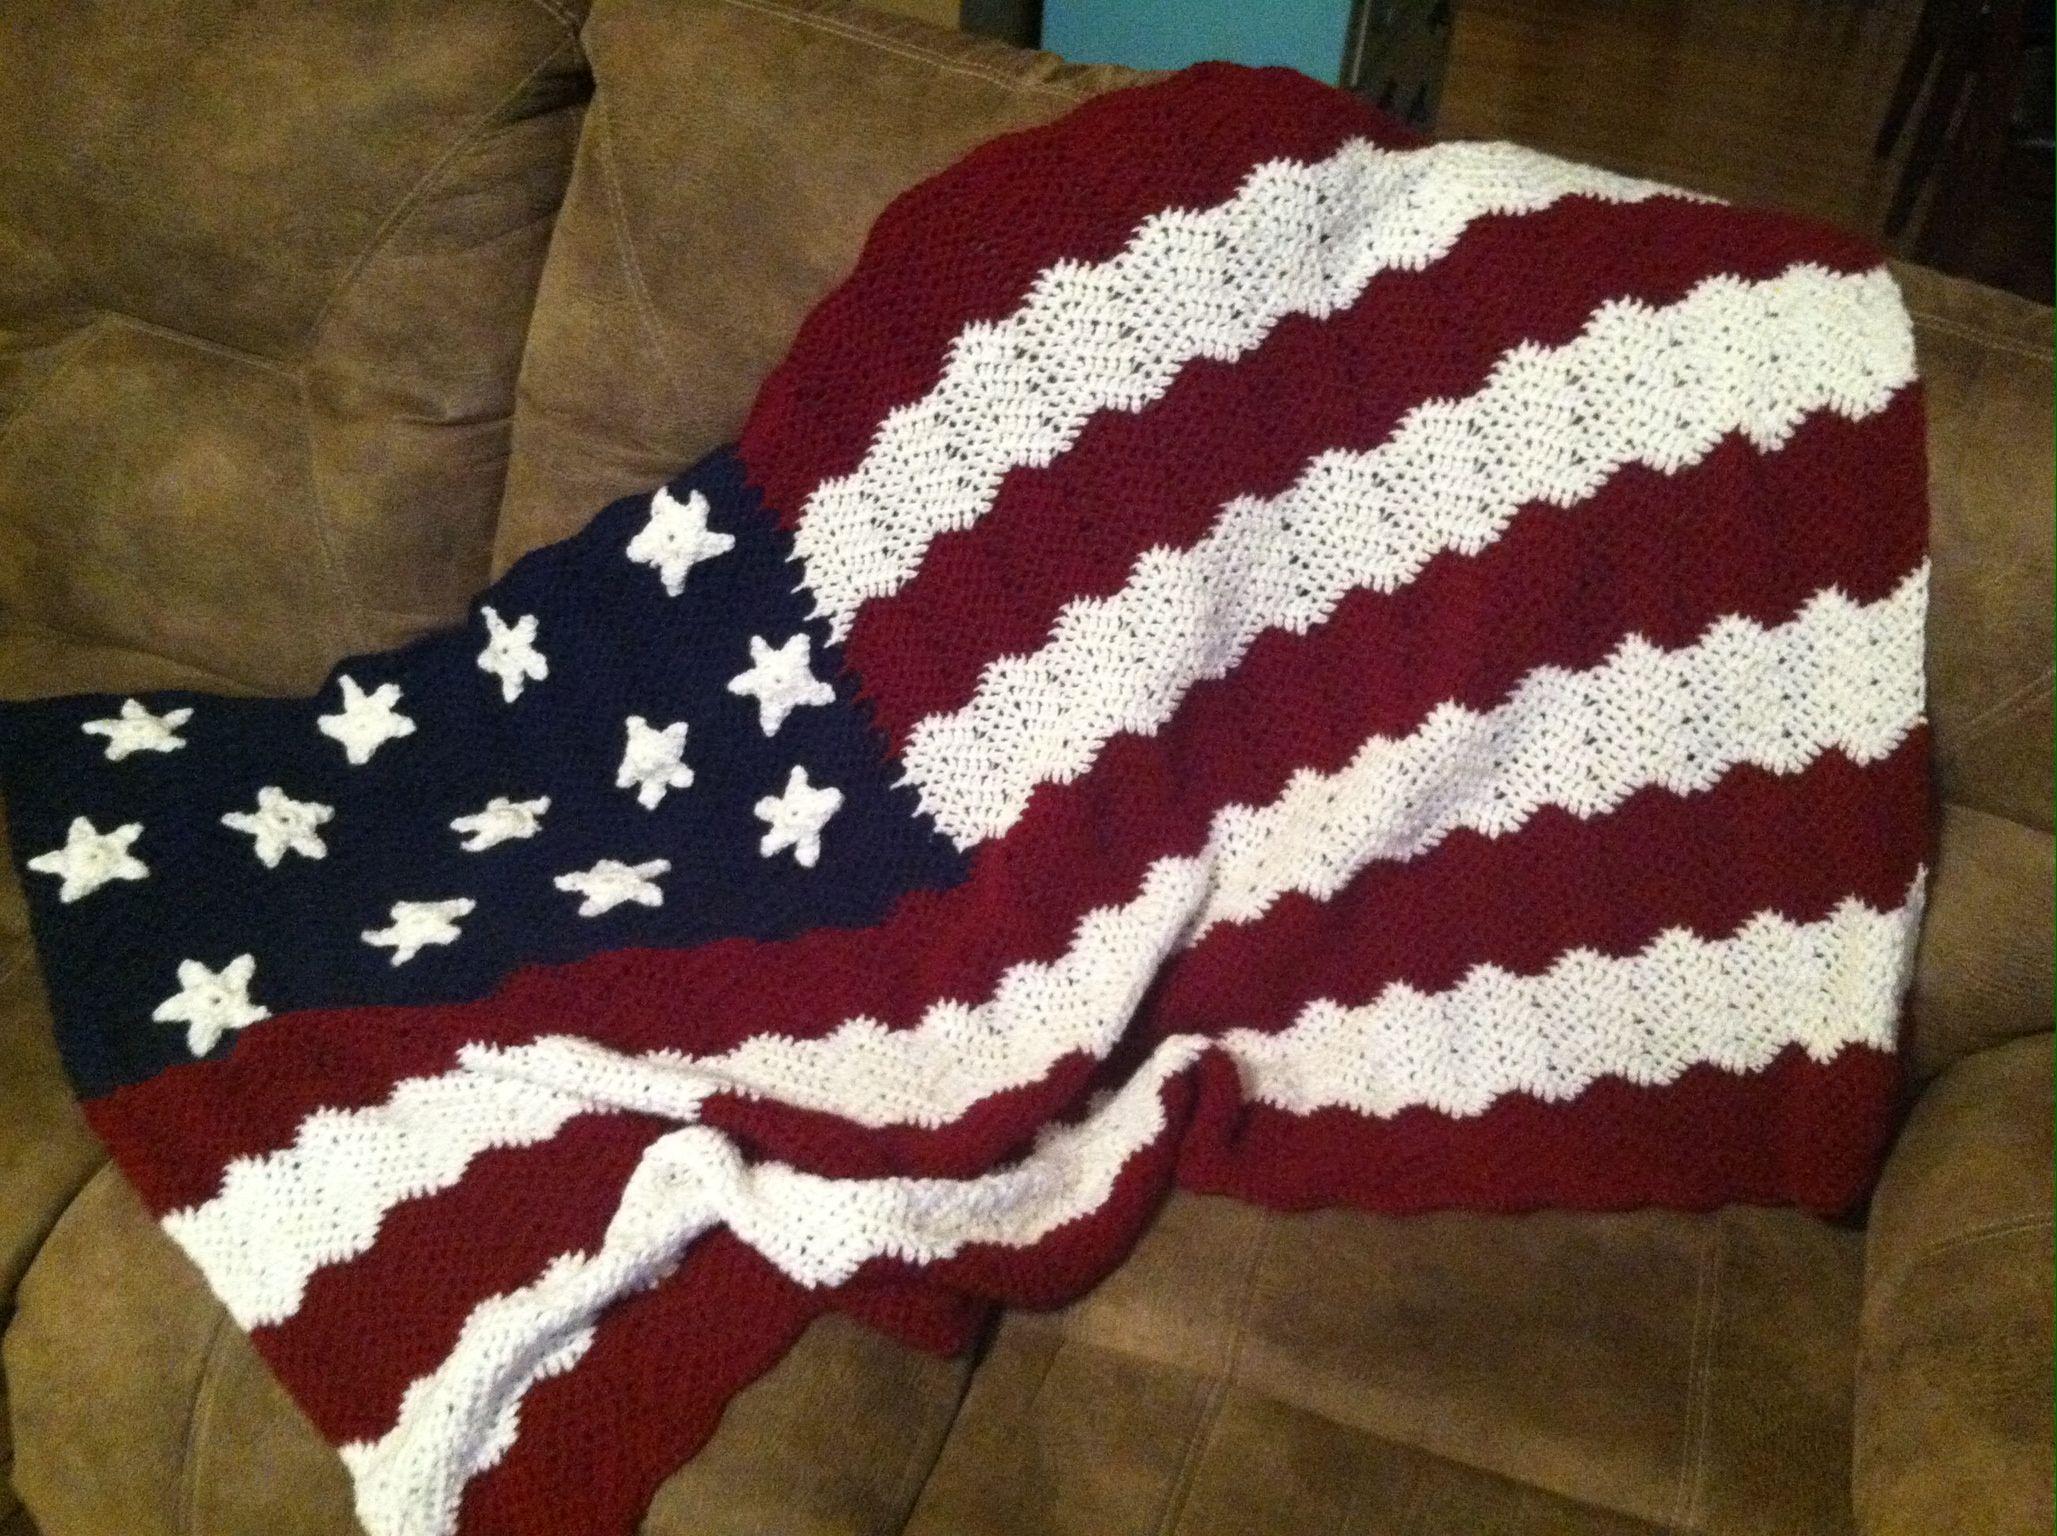 Kara american flag - 2 part 8